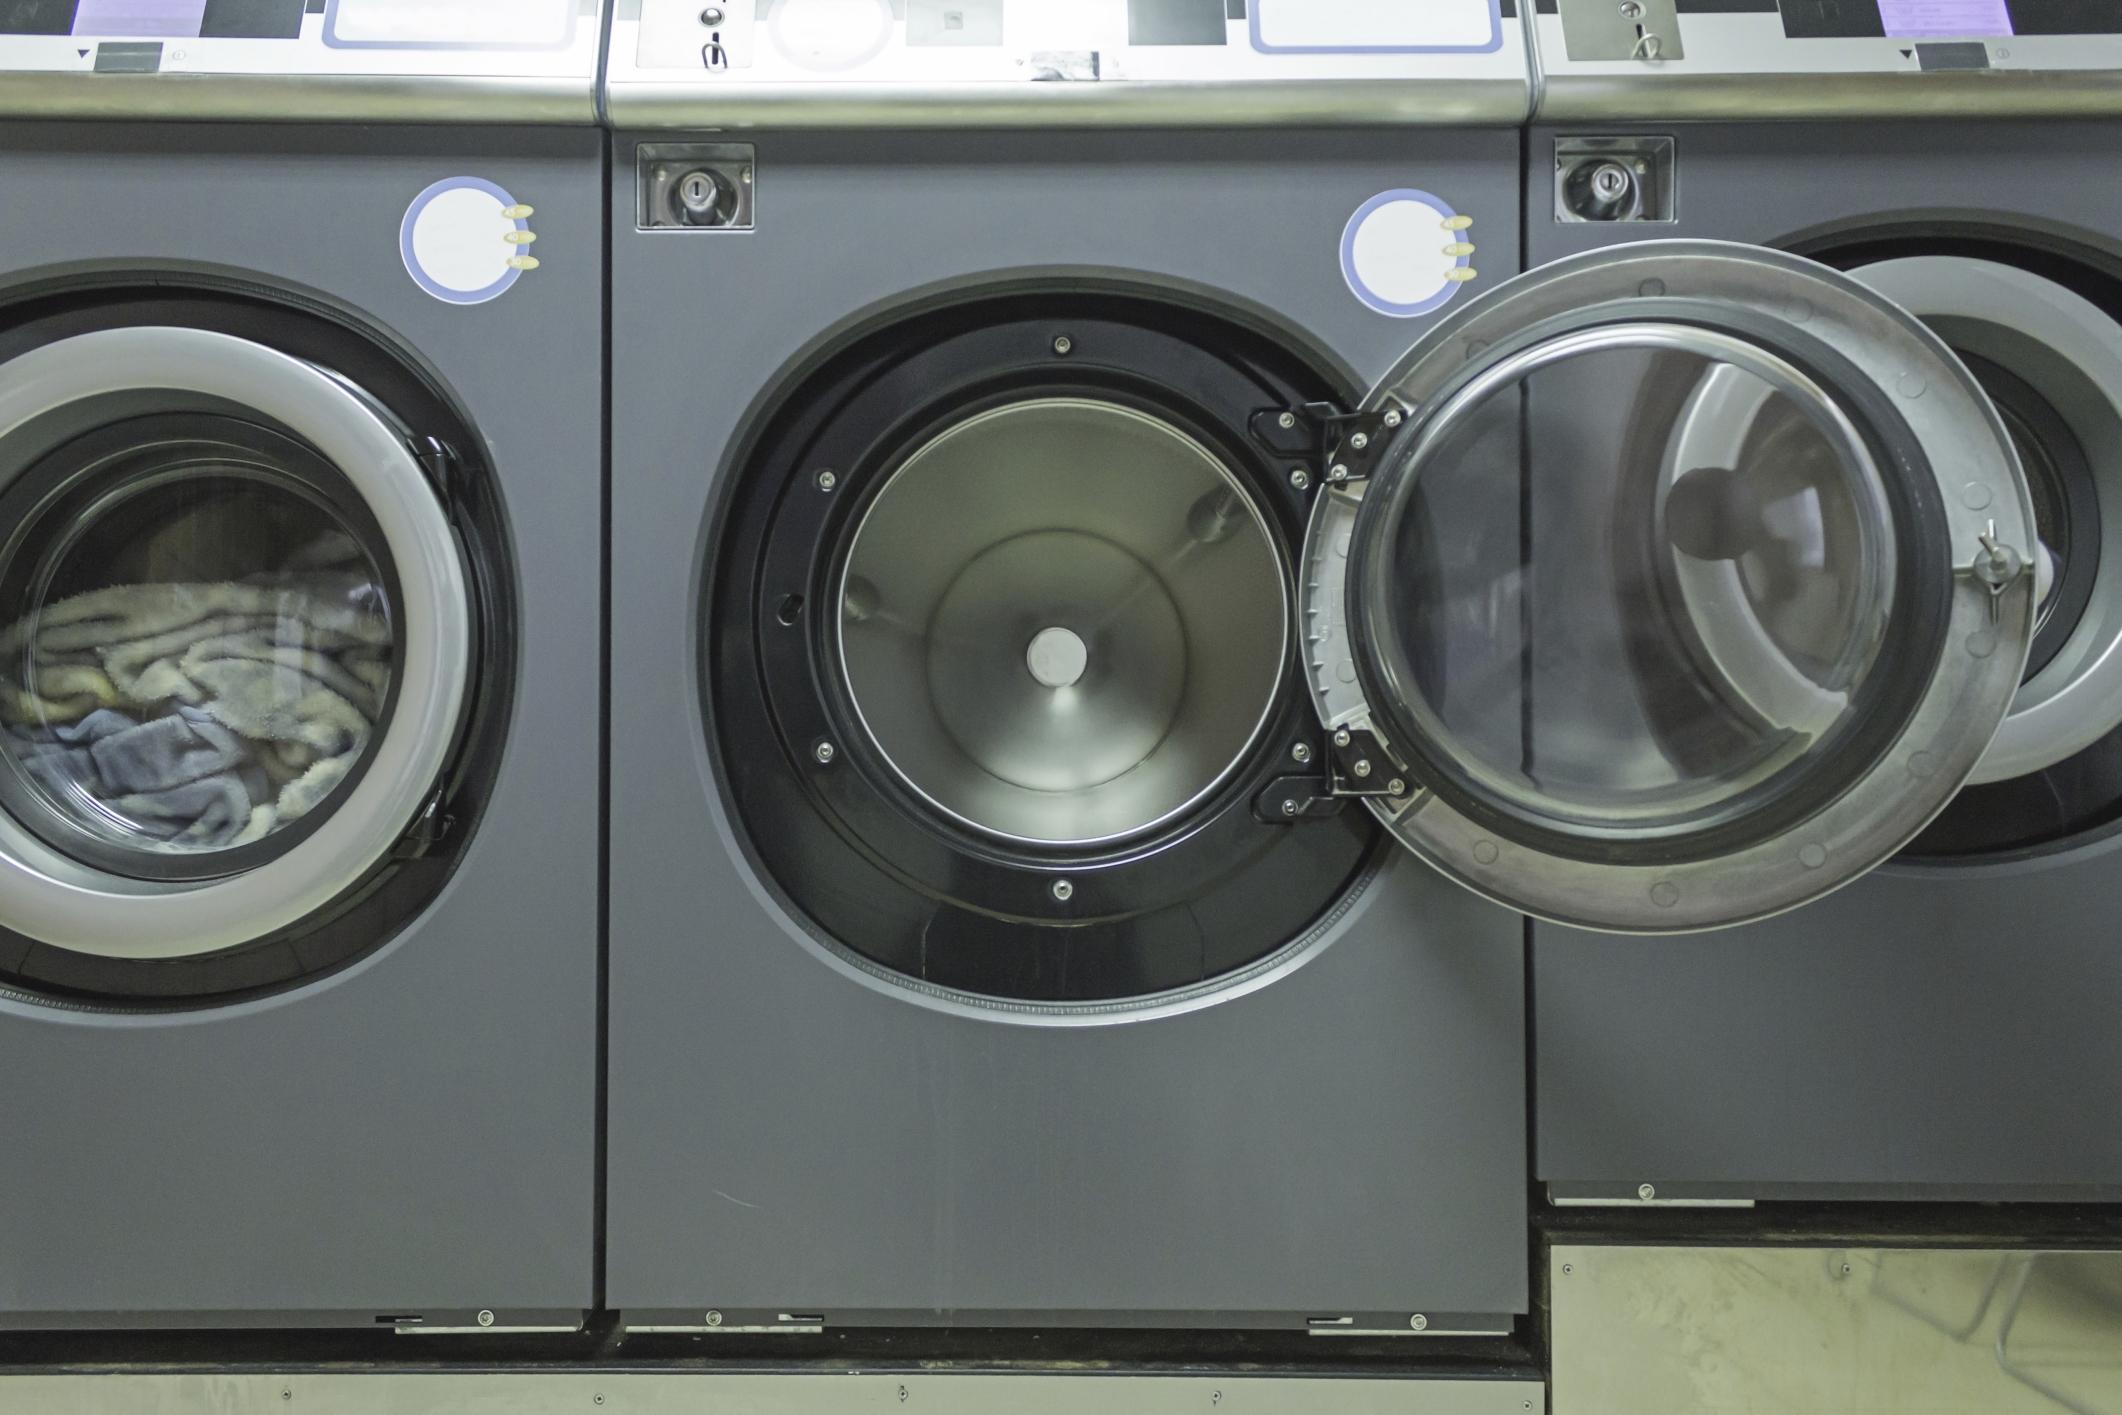 Virginia laundromat still closed after carbon monoxide scare